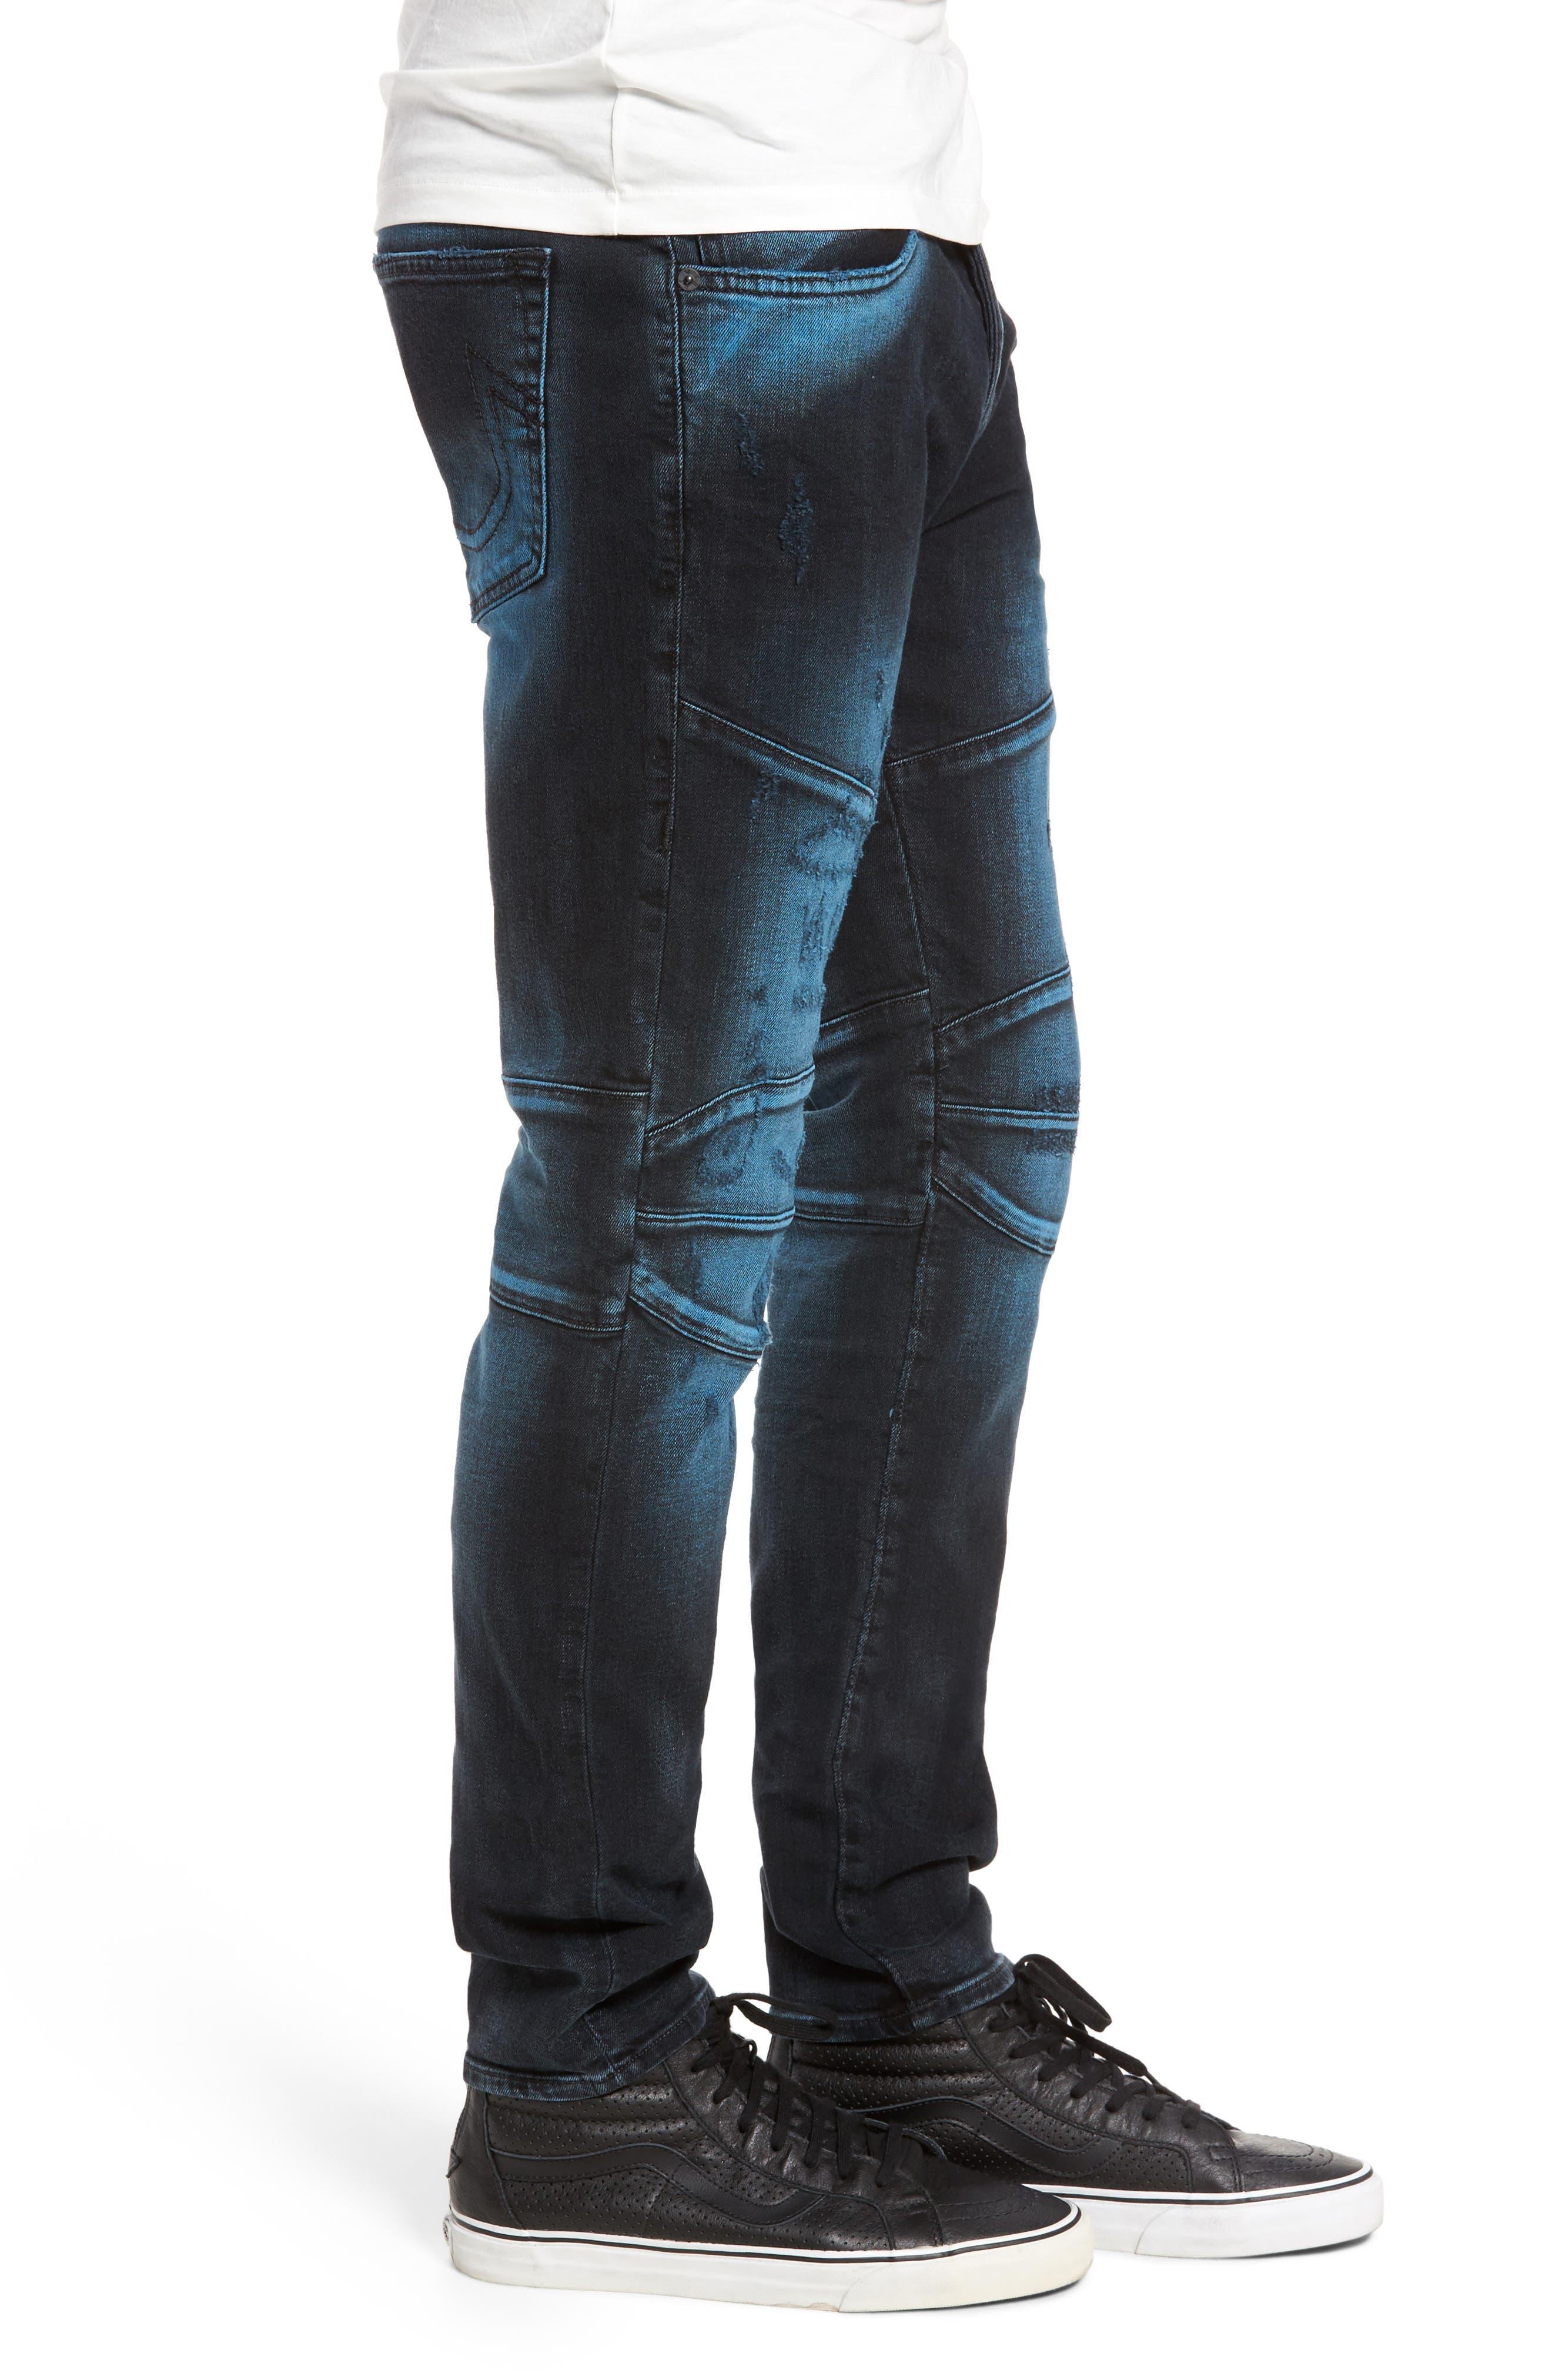 Rocco Skinny Fit Jeans,                             Alternate thumbnail 3, color,                             Blue Blaze